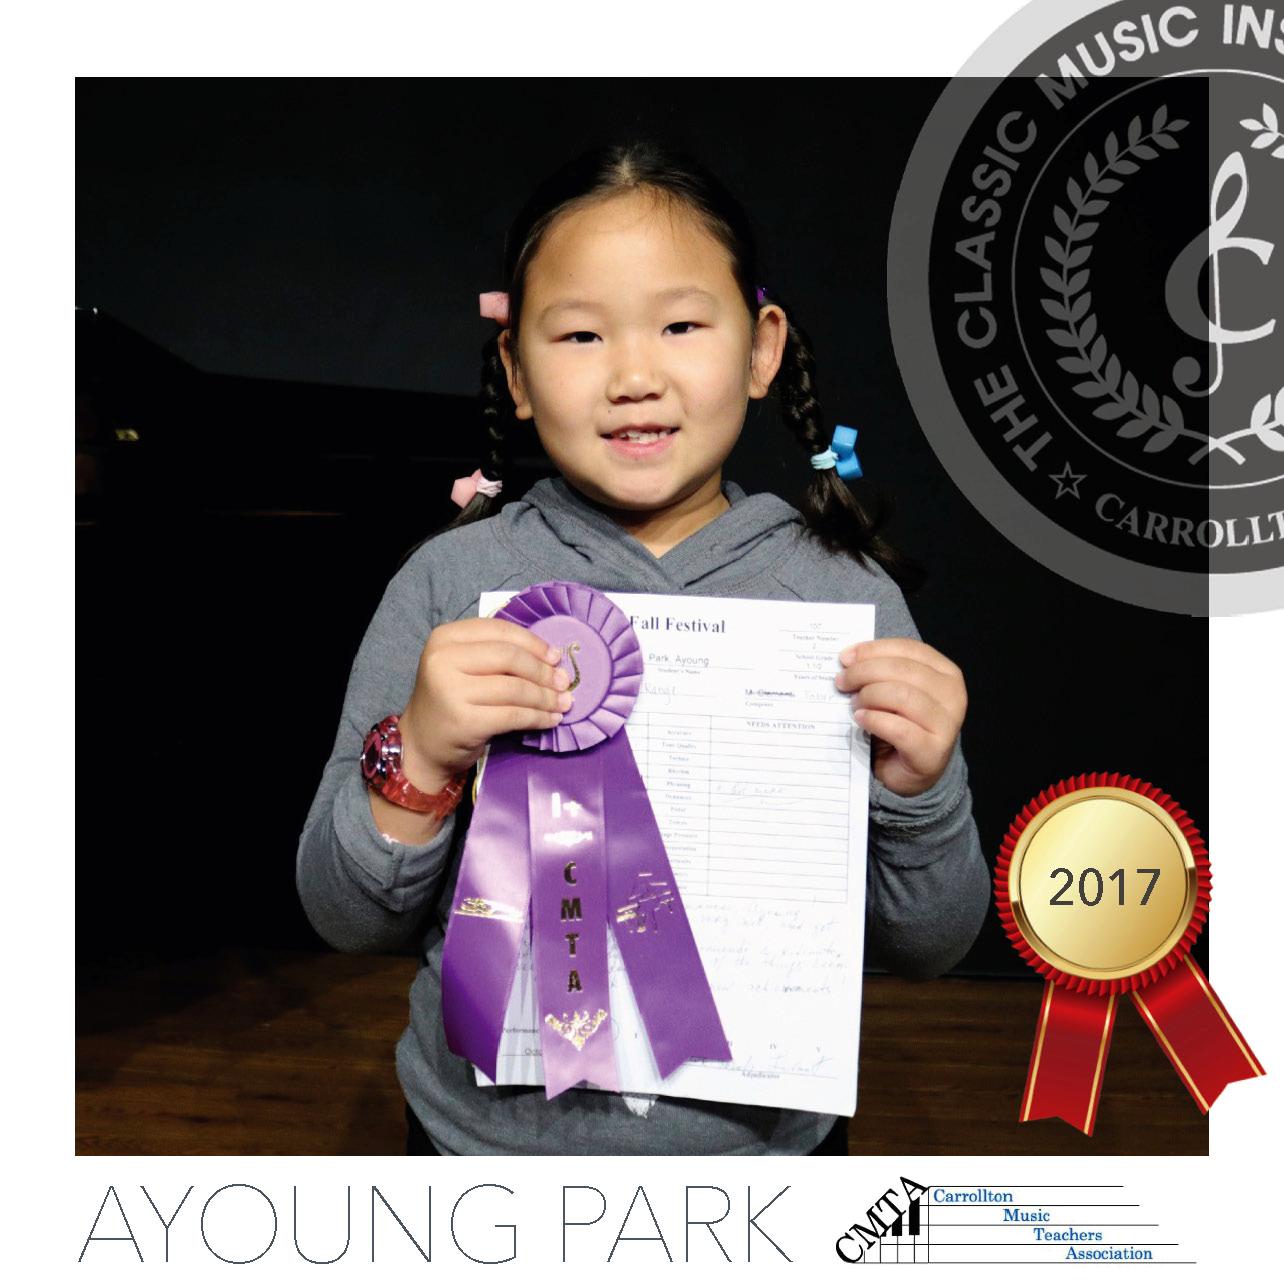 Ayoung Park